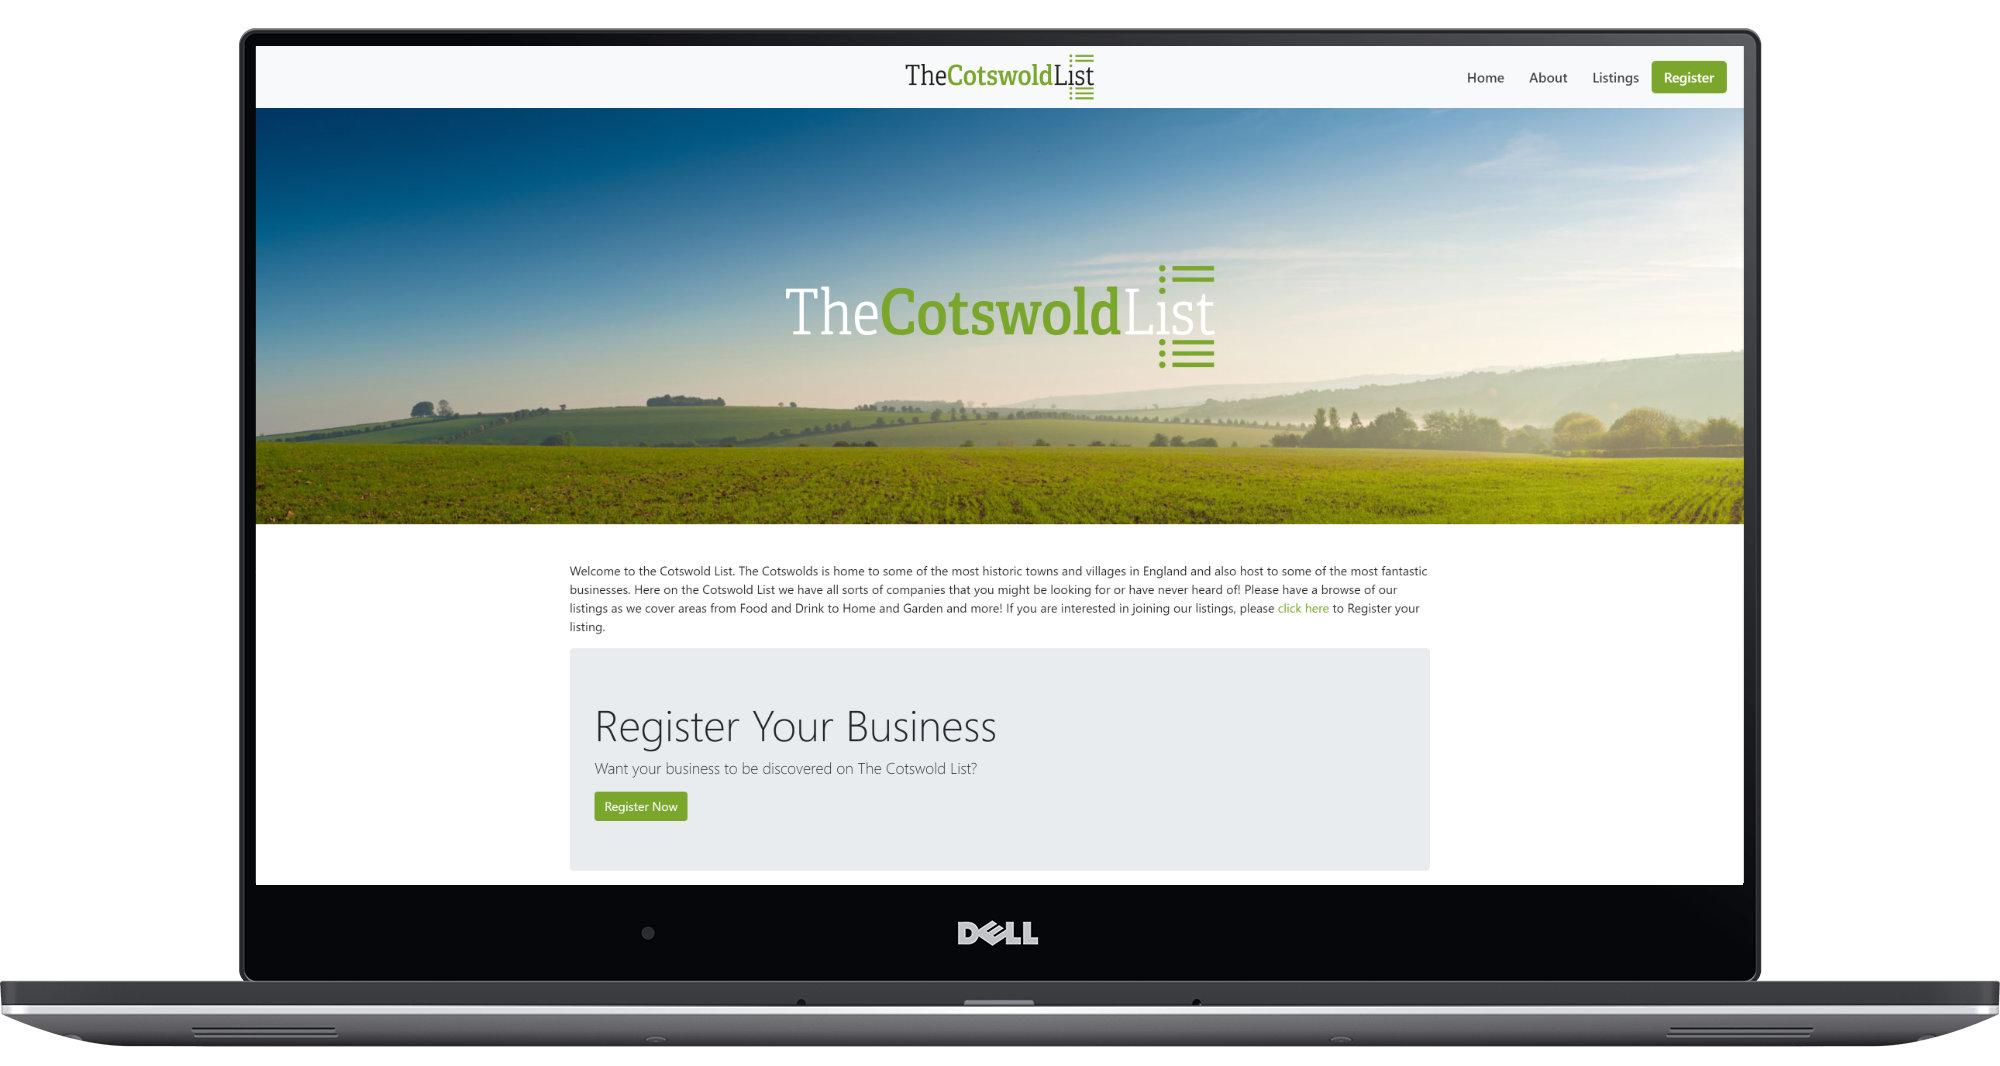 The Cotswold List Laptop Screenshot